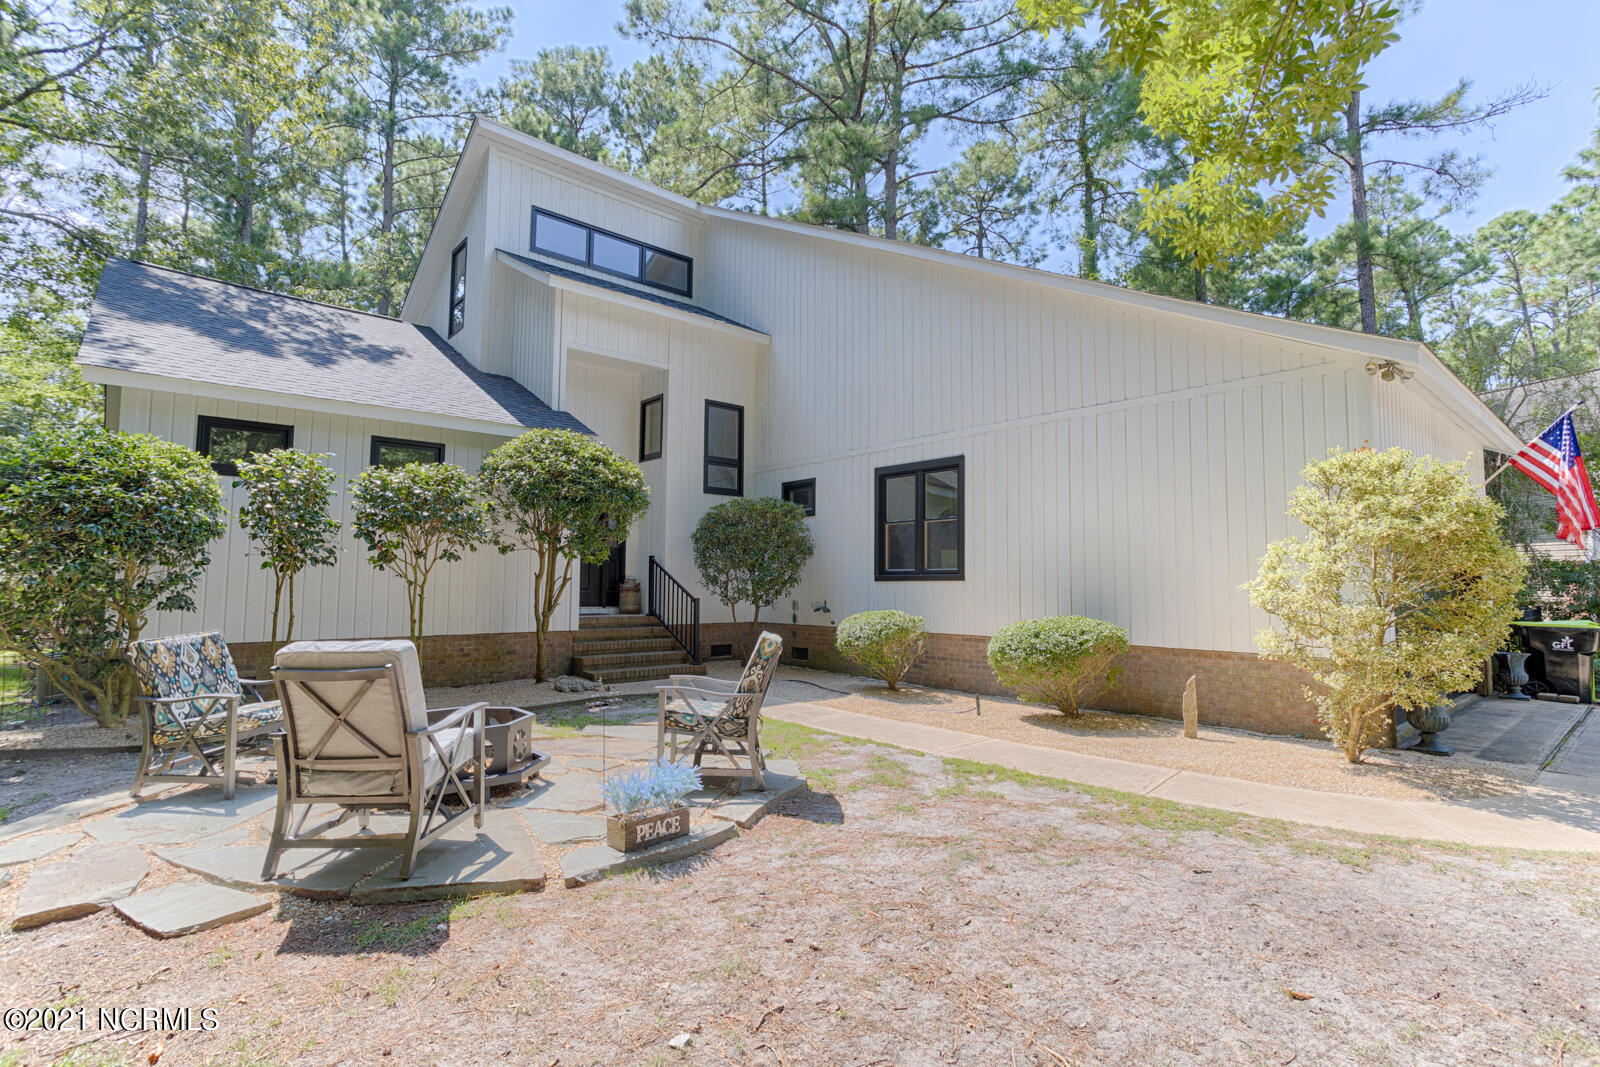 1037 Bracken Fern Drive, New Bern, North Carolina 28560, 3 Bedrooms Bedrooms, 9 Rooms Rooms,2 BathroomsBathrooms,Single family residence,For sale,Bracken Fern,100288053